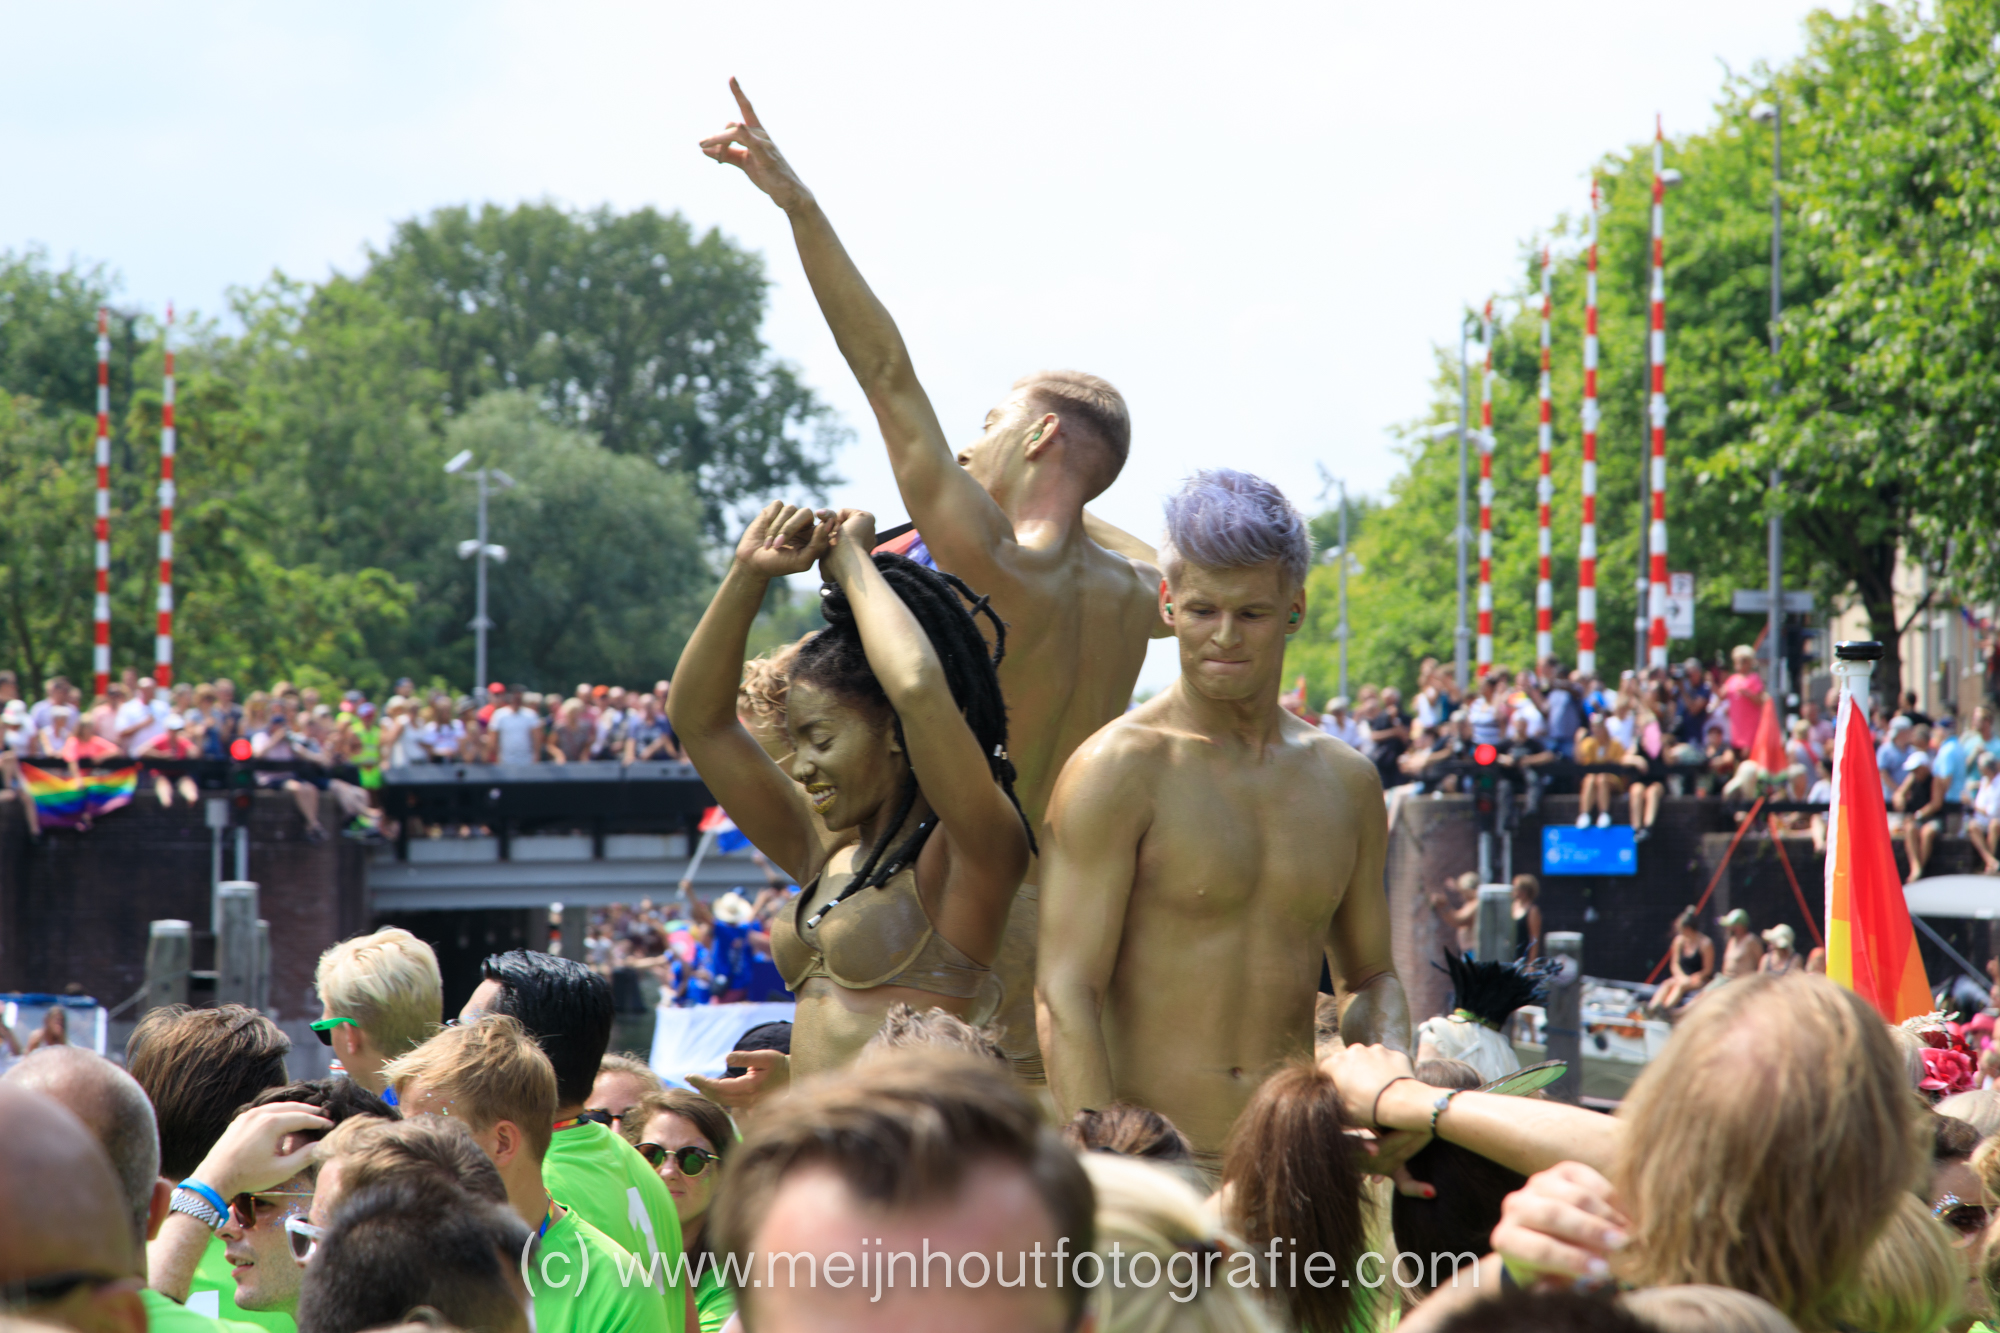 20180804-_MG_0127 Deloitte Gay Pride 2018.jpg